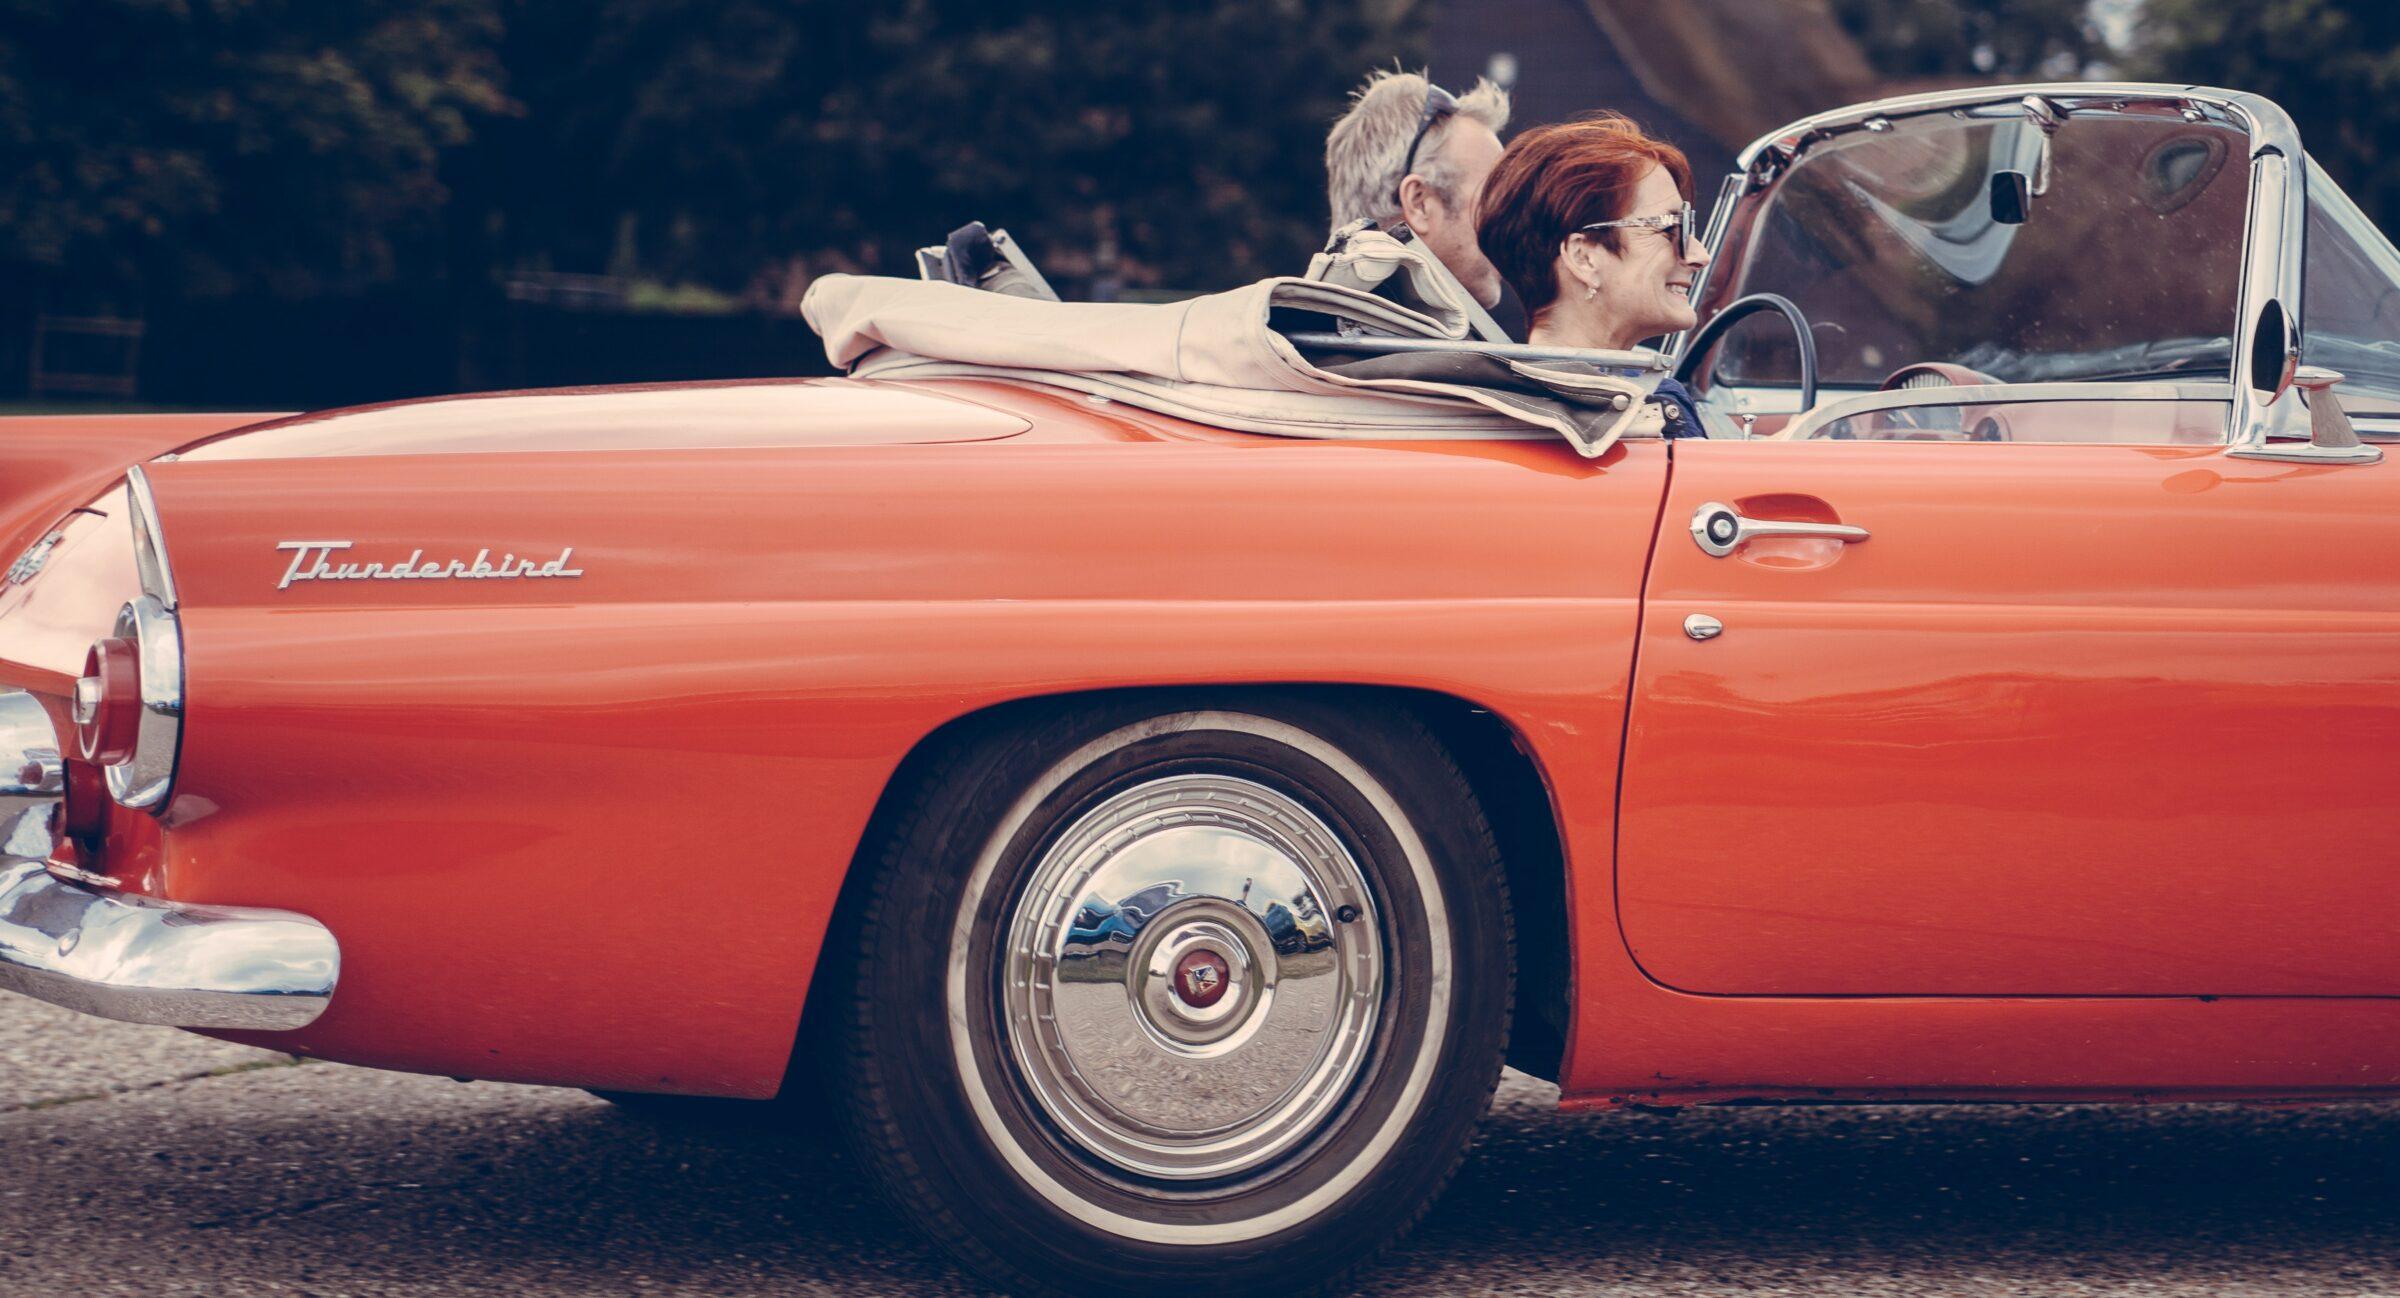 cropped-asphalt-auto-automobile-173286-1.jpg